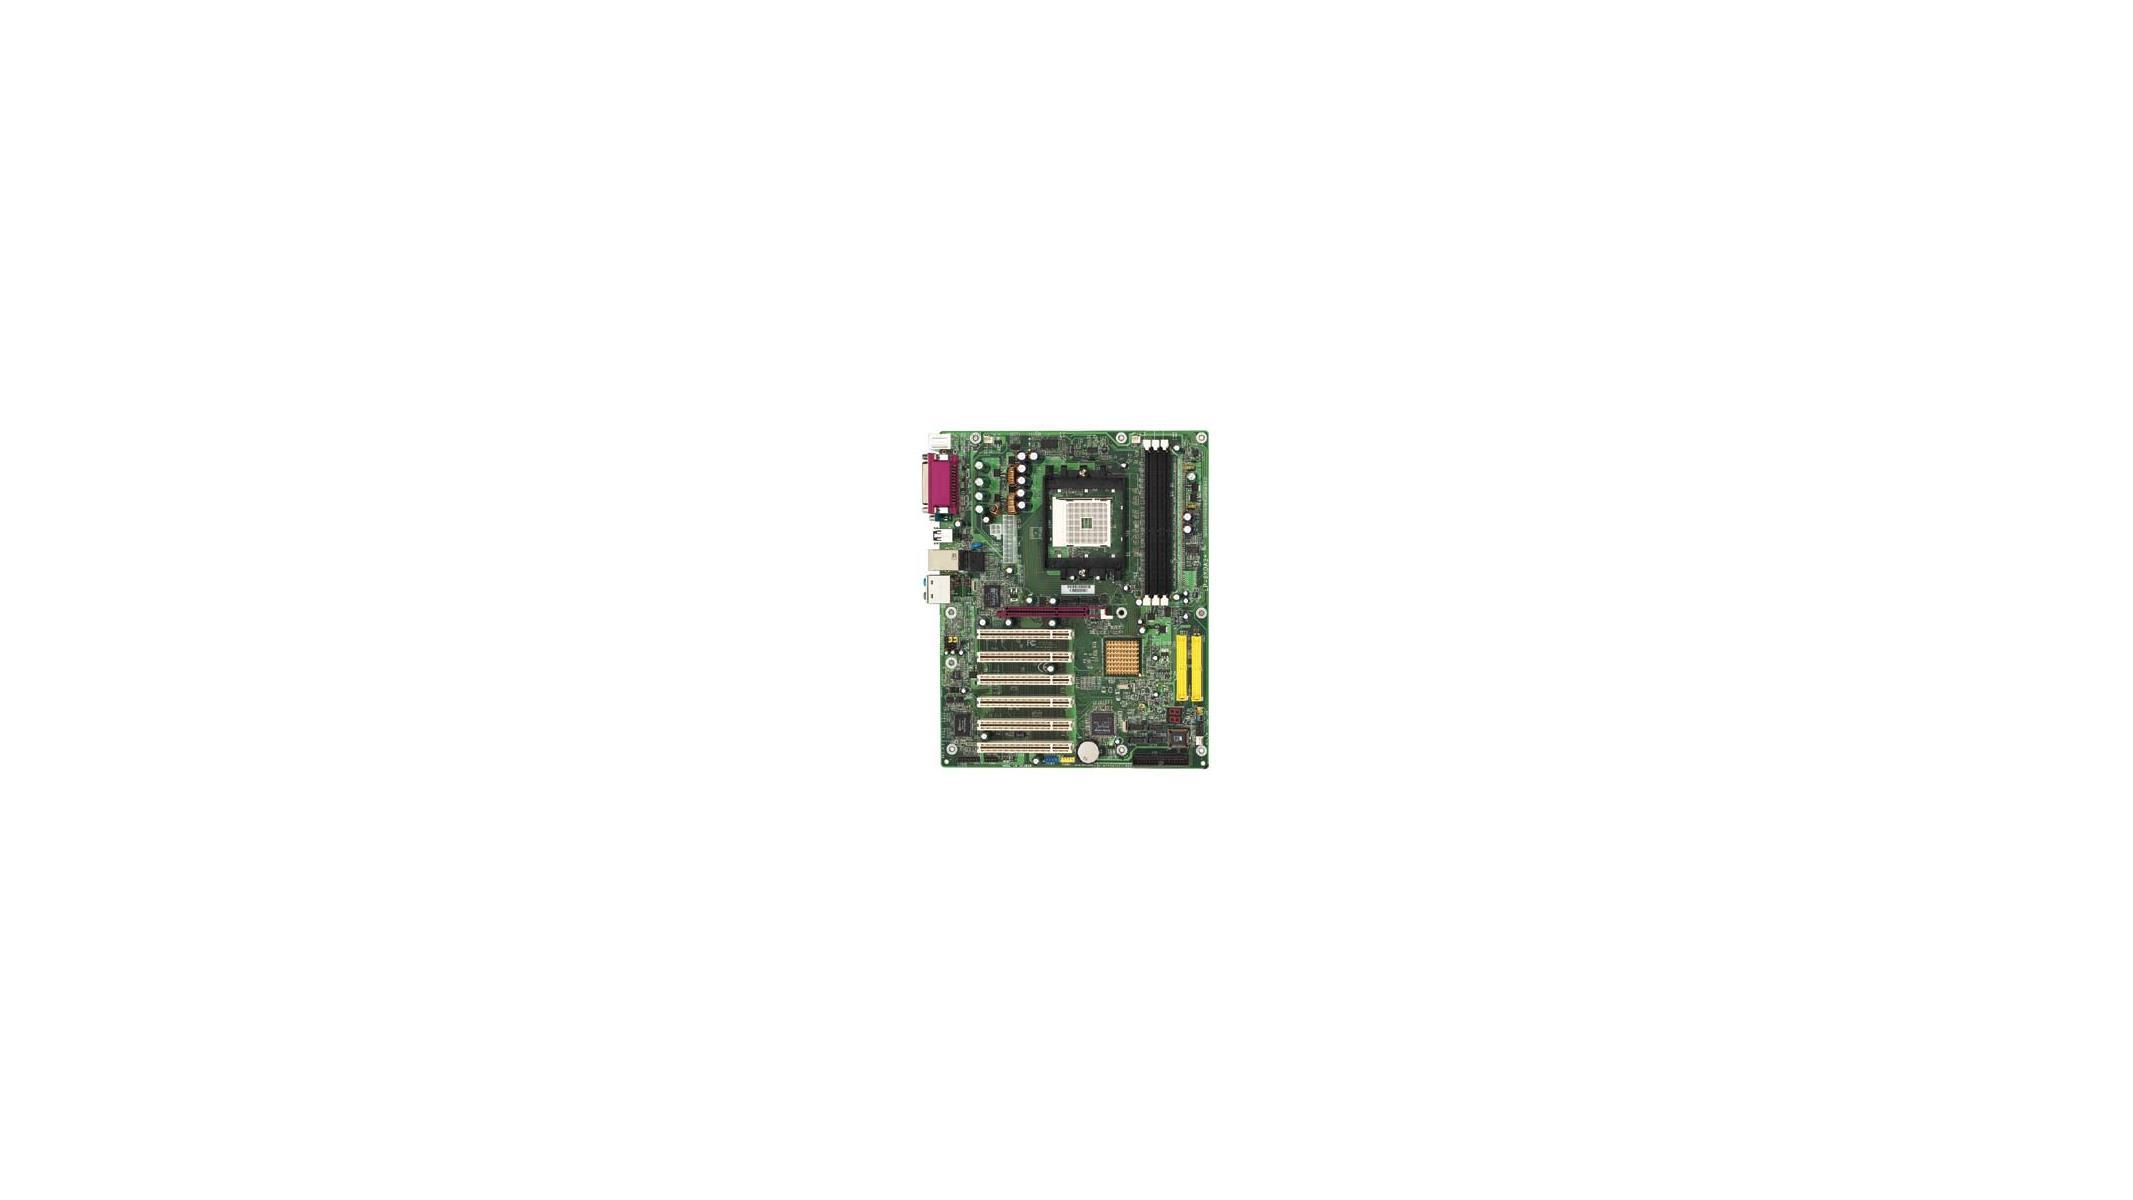 EPOX EP-8KDA3 LAN WINDOWS 8 X64 DRIVER DOWNLOAD